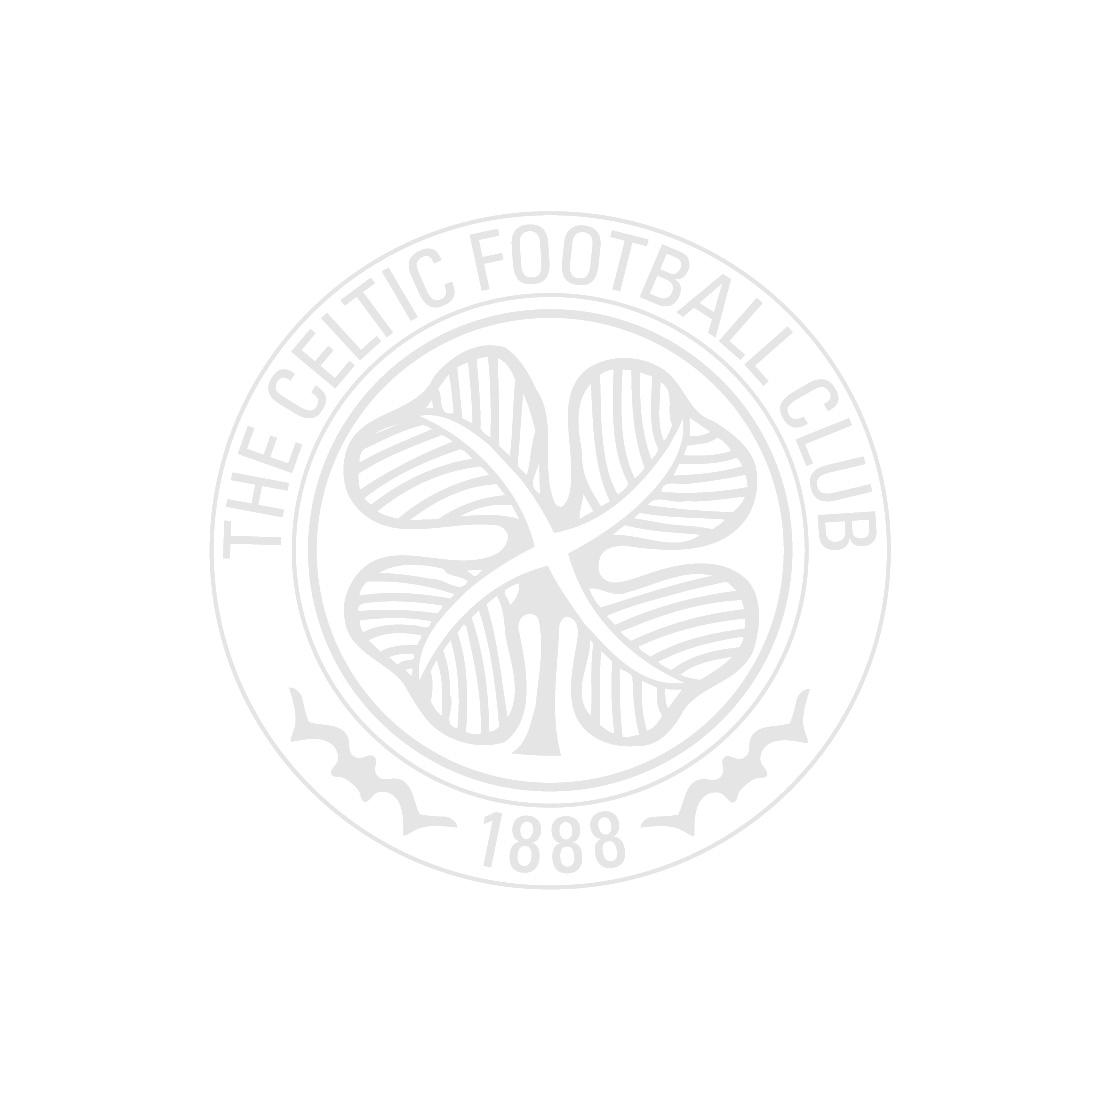 Celtic FC Wine Gums